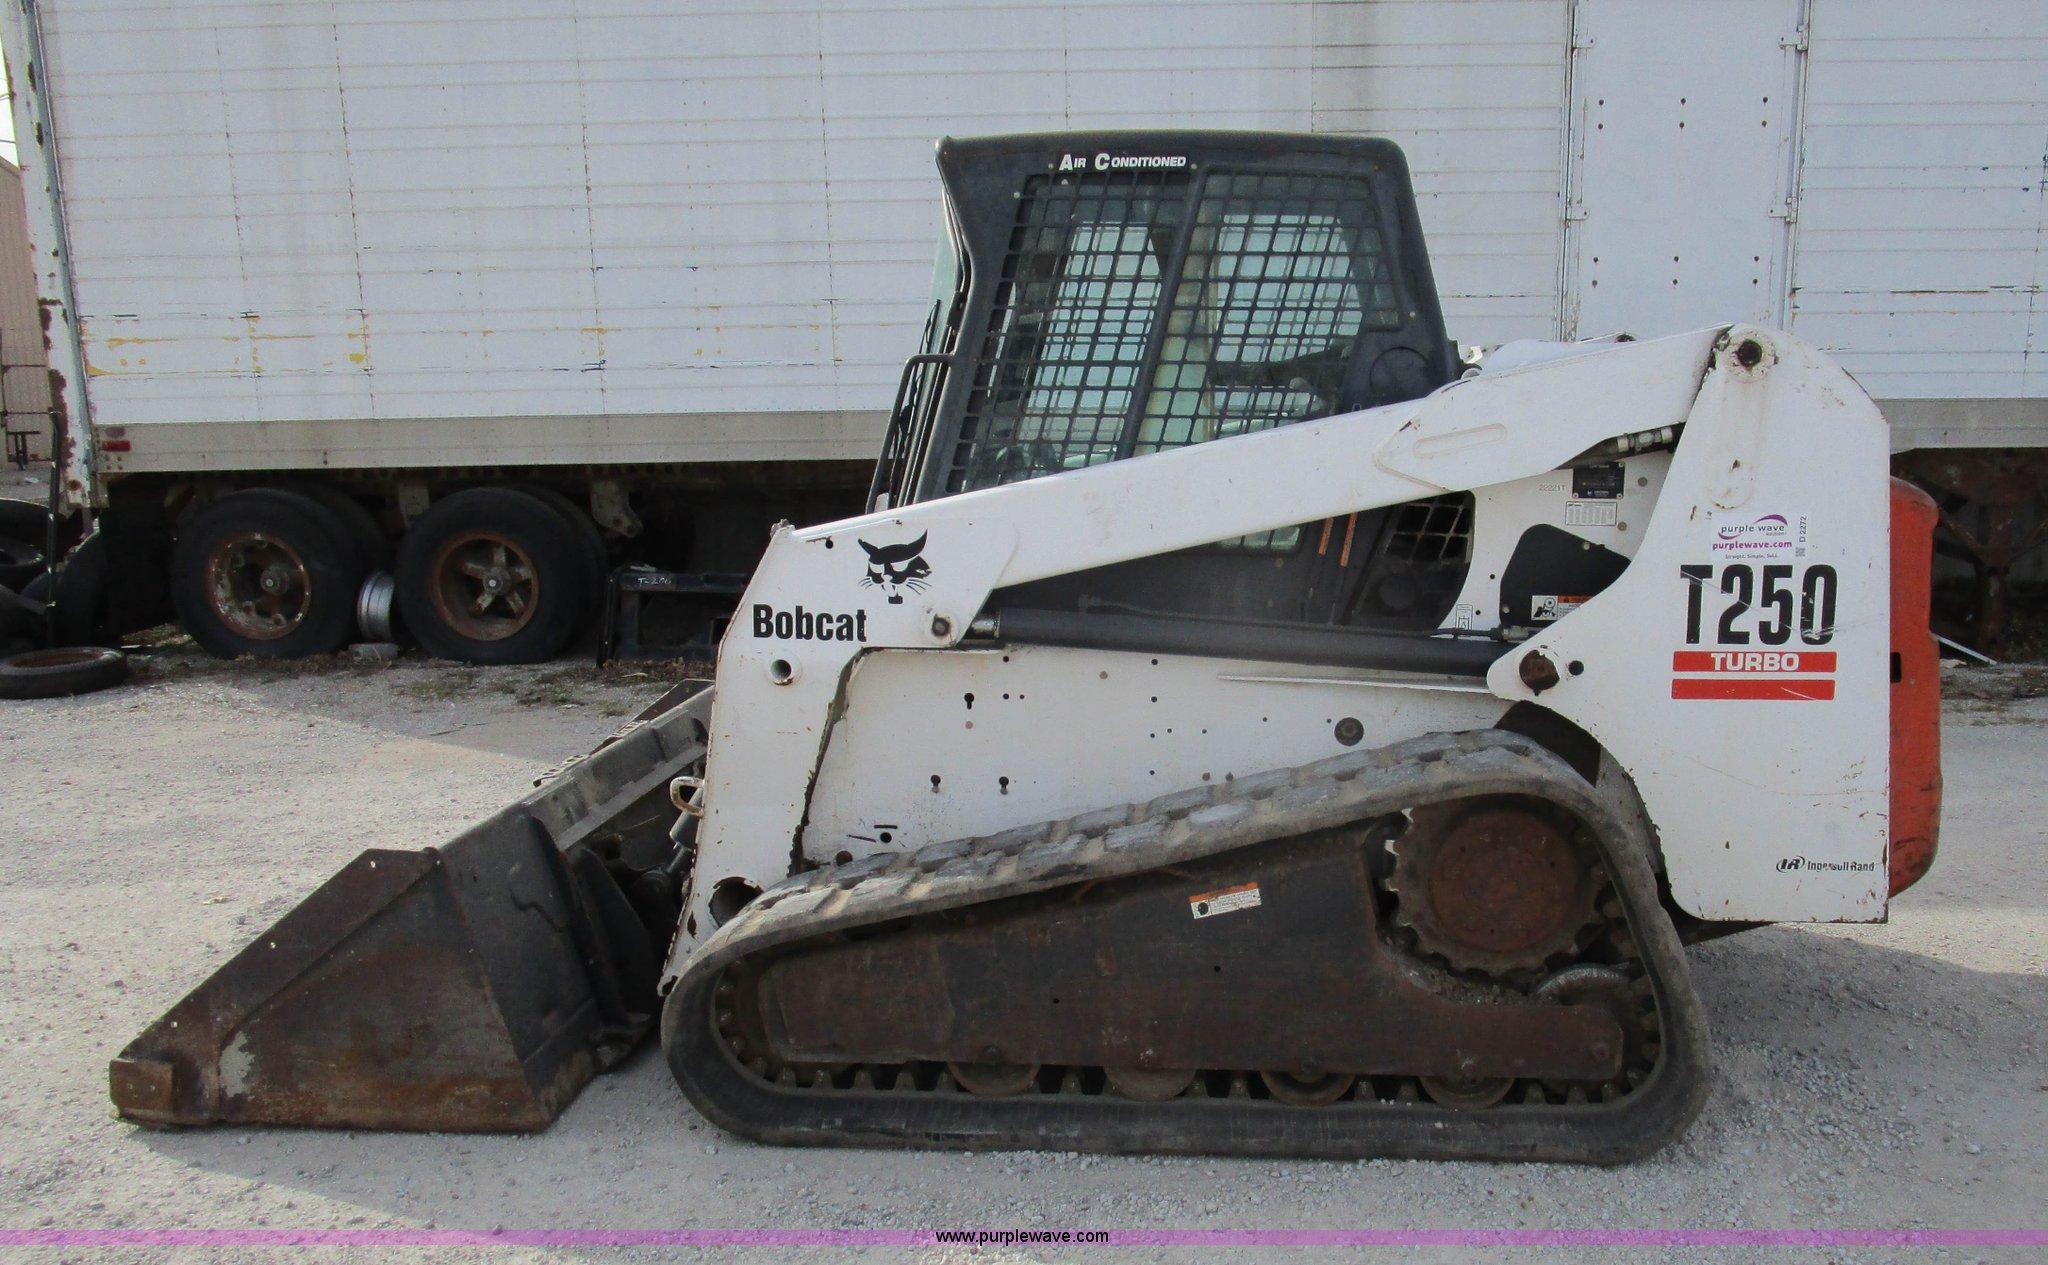 ... T250 skid steer Full size in new window ...